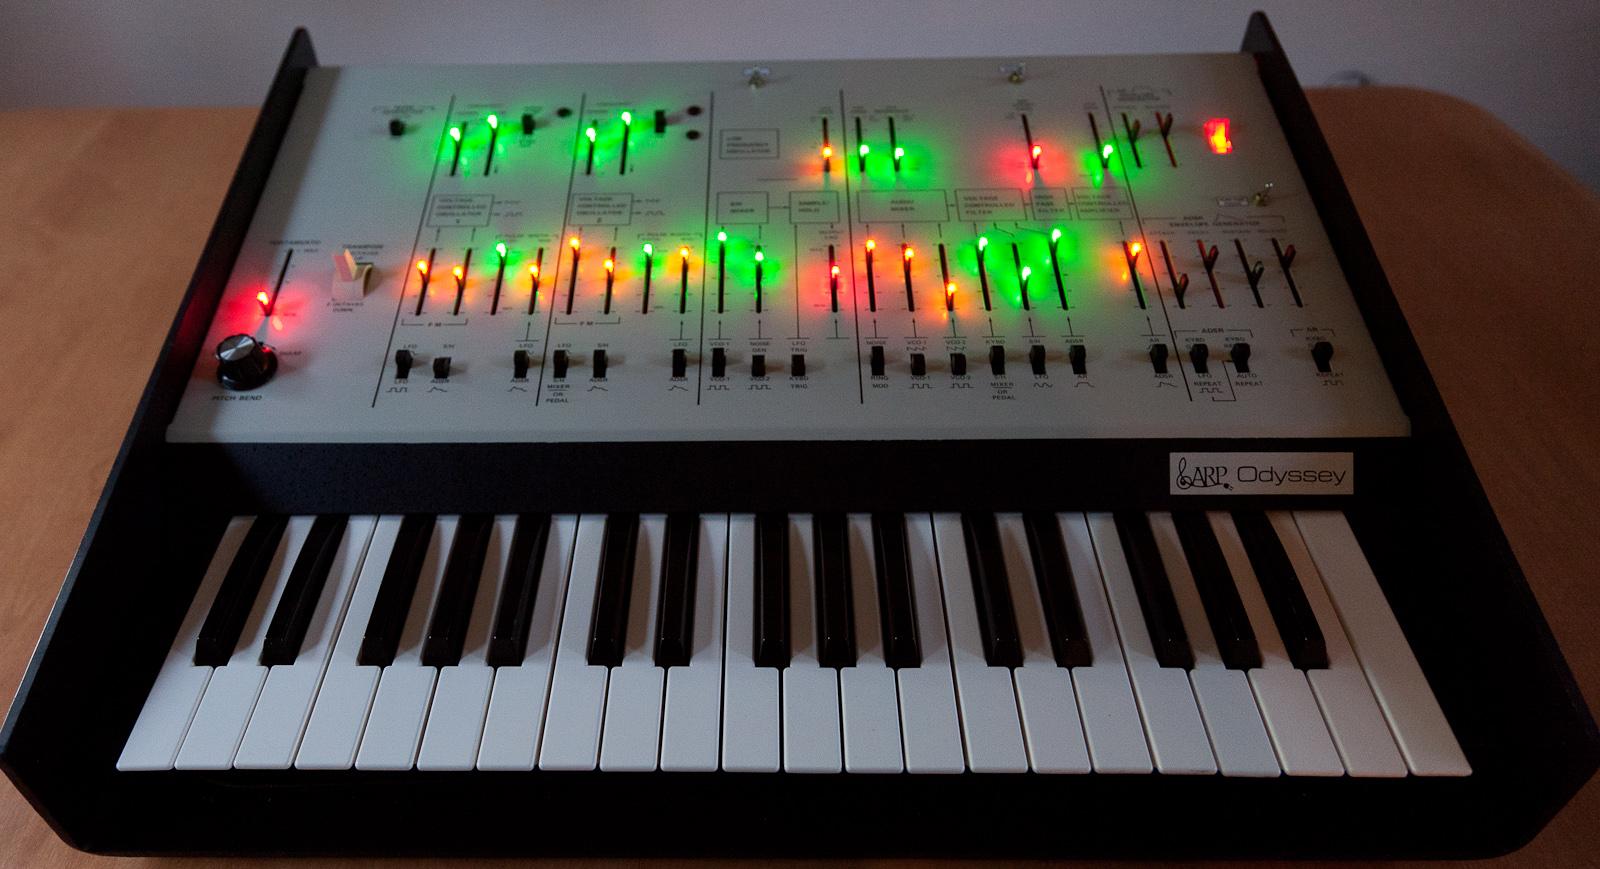 Electronic Musical Instruments : August new gear thread gearslutz pro audio community